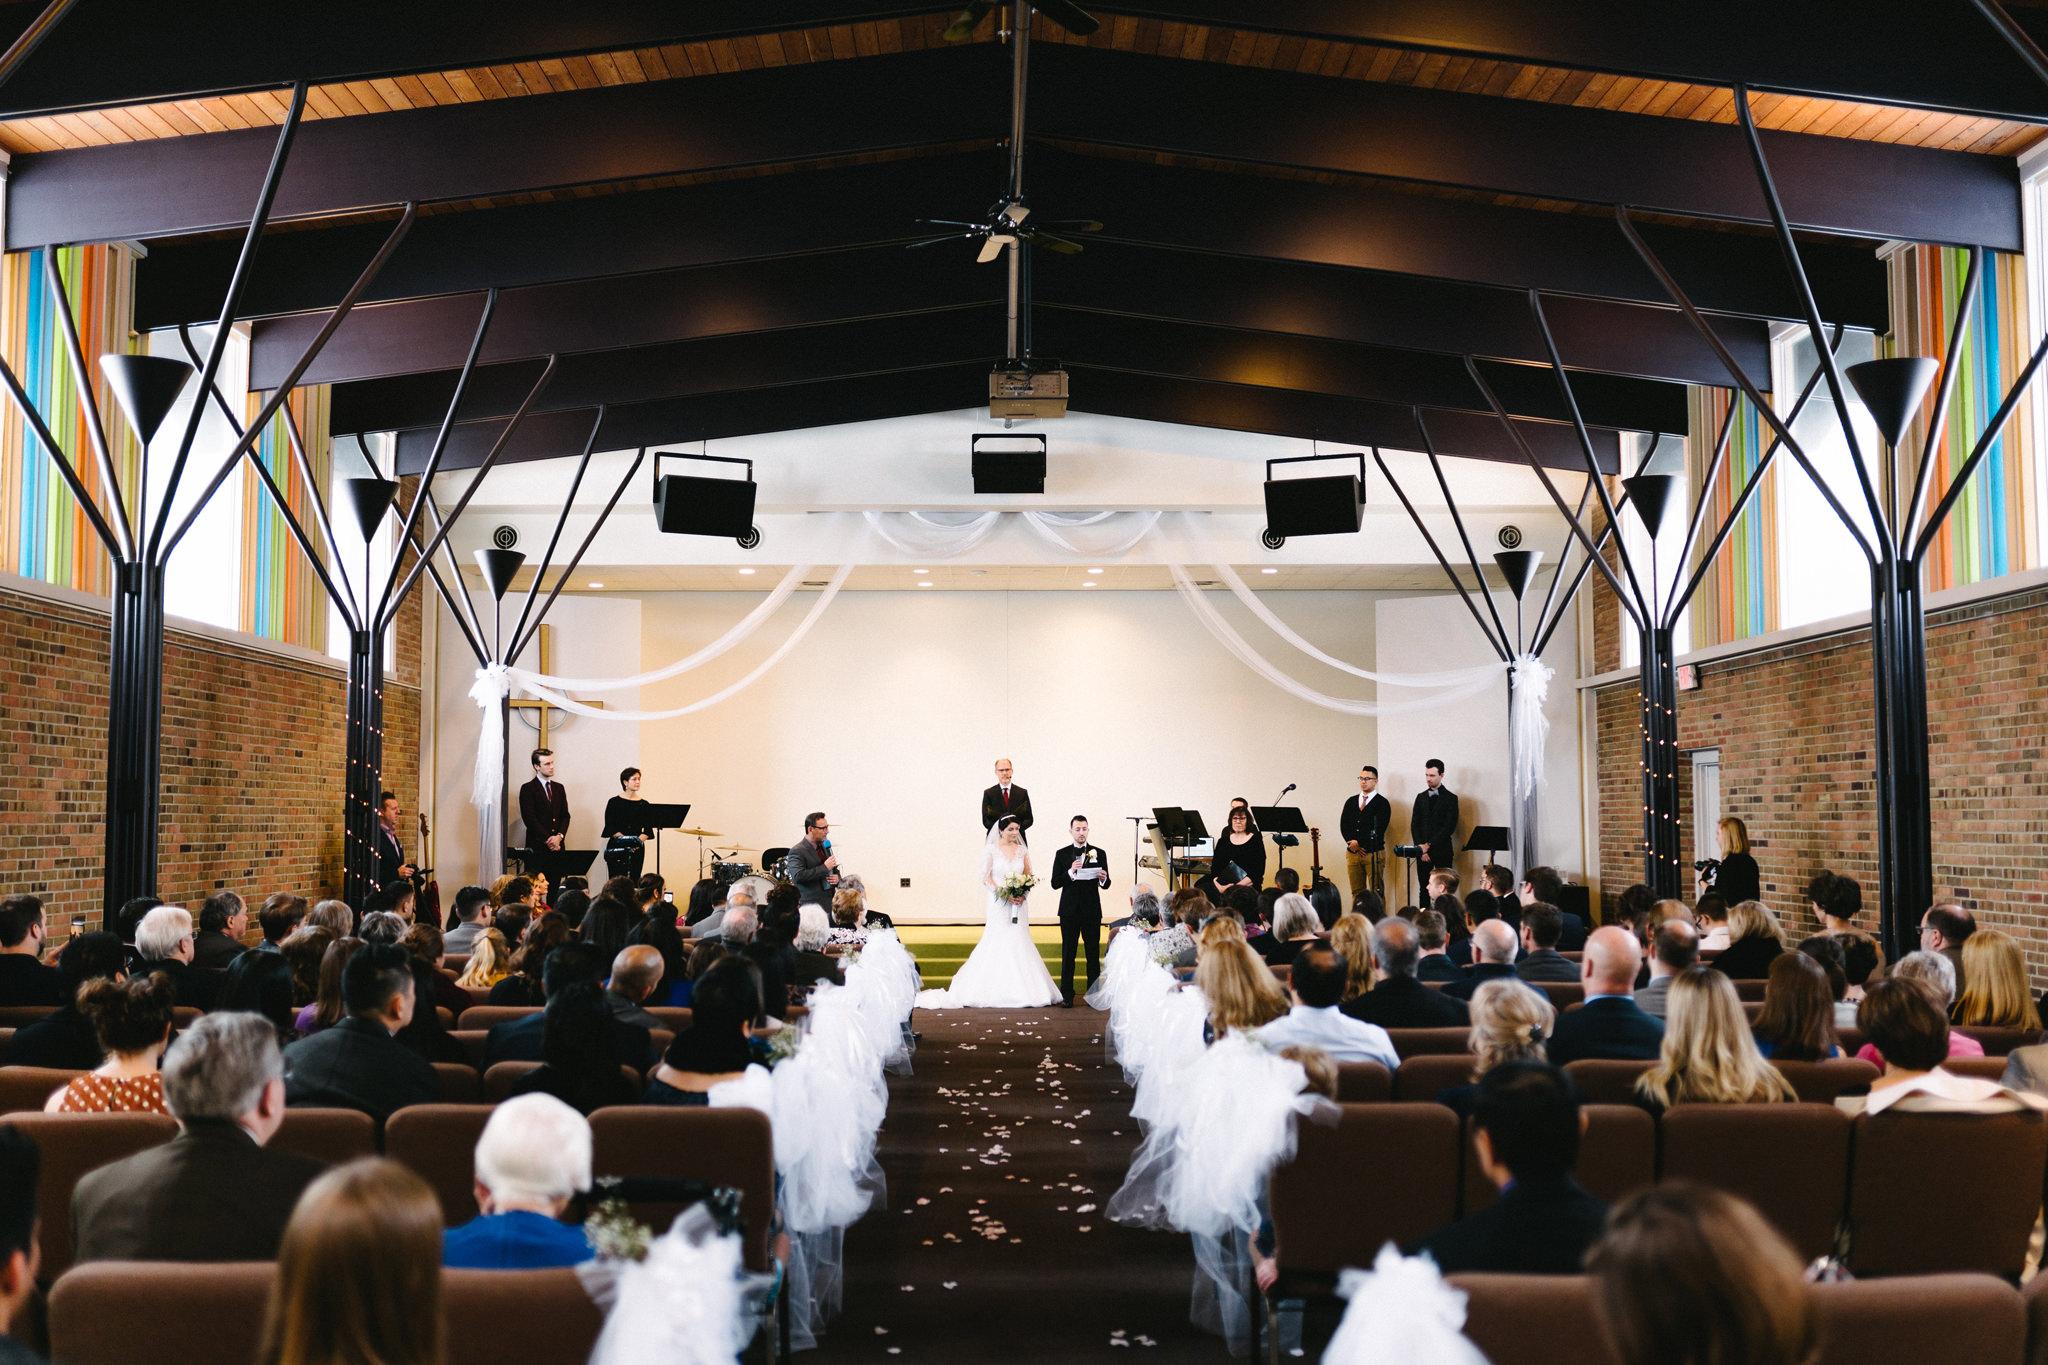 015-rempel-photography-chicago-wedding-inspiration-susan-daniel-michigan-metro-detroit-christian-church-holly-vault-cupcakes-and-kisses.jpg